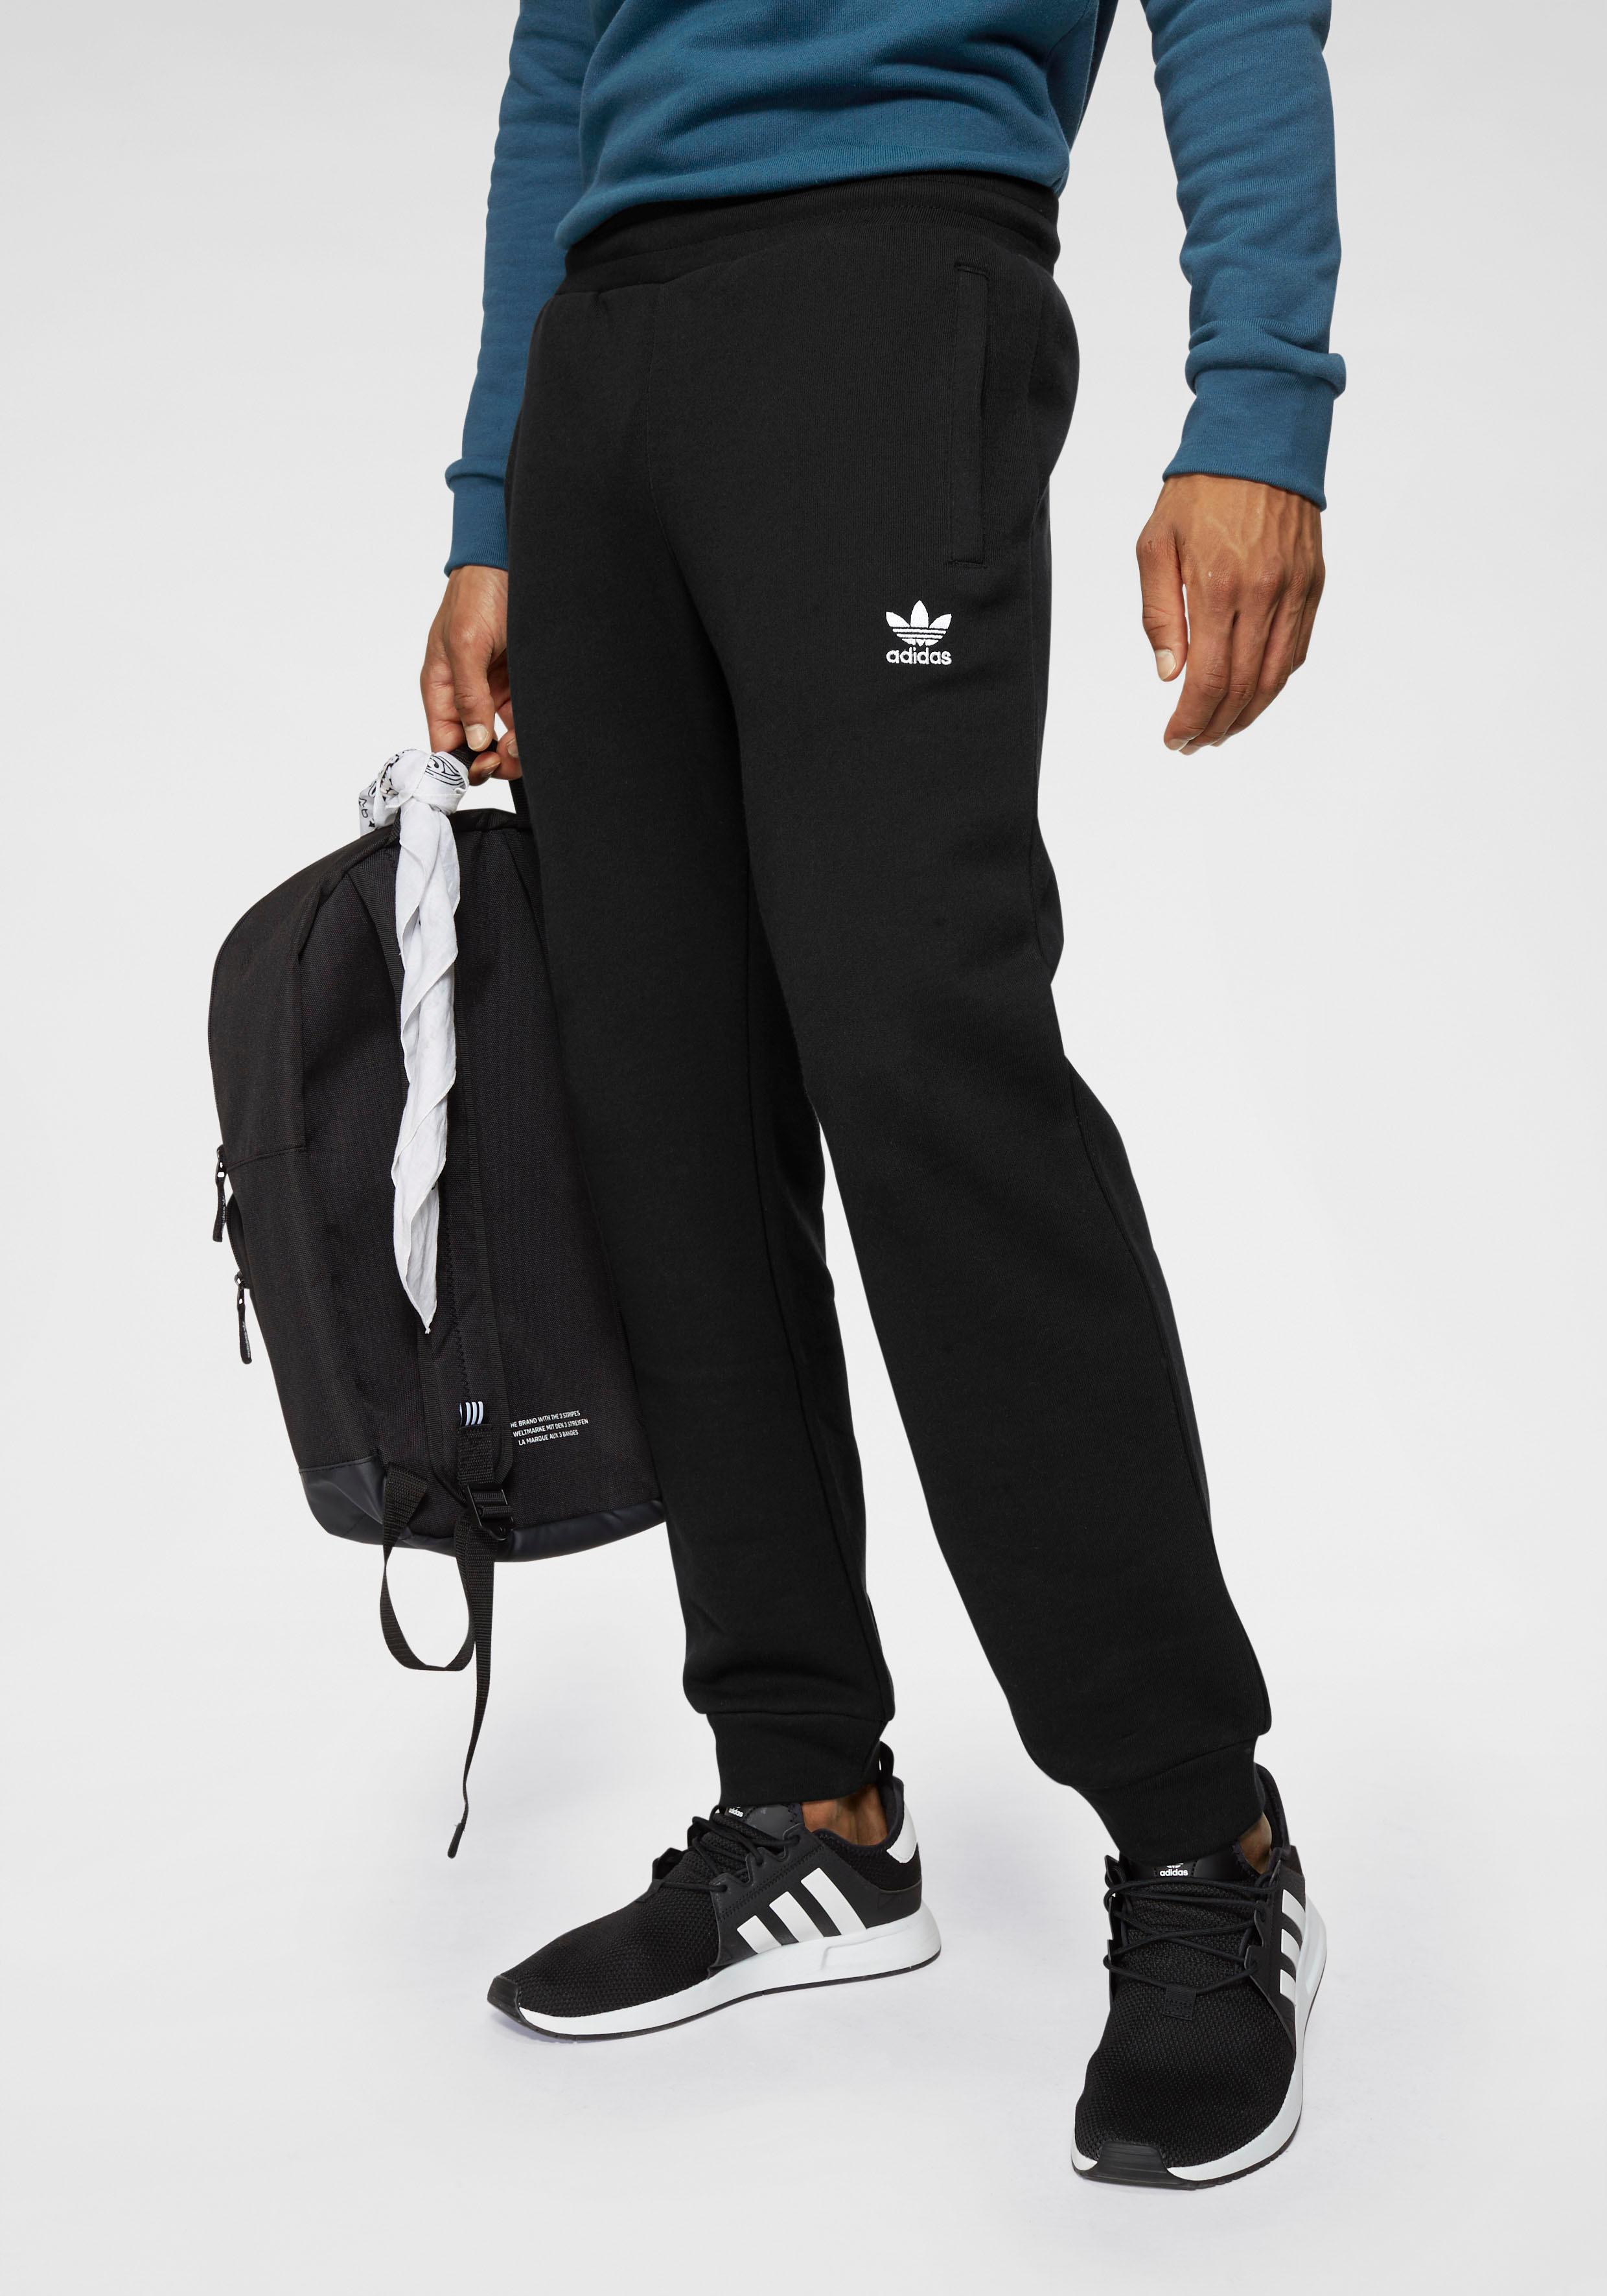 0977ffd655a9b7 adidas Originals Jogginghose »TREFOIL PANT« im Onlineshop » BAUR